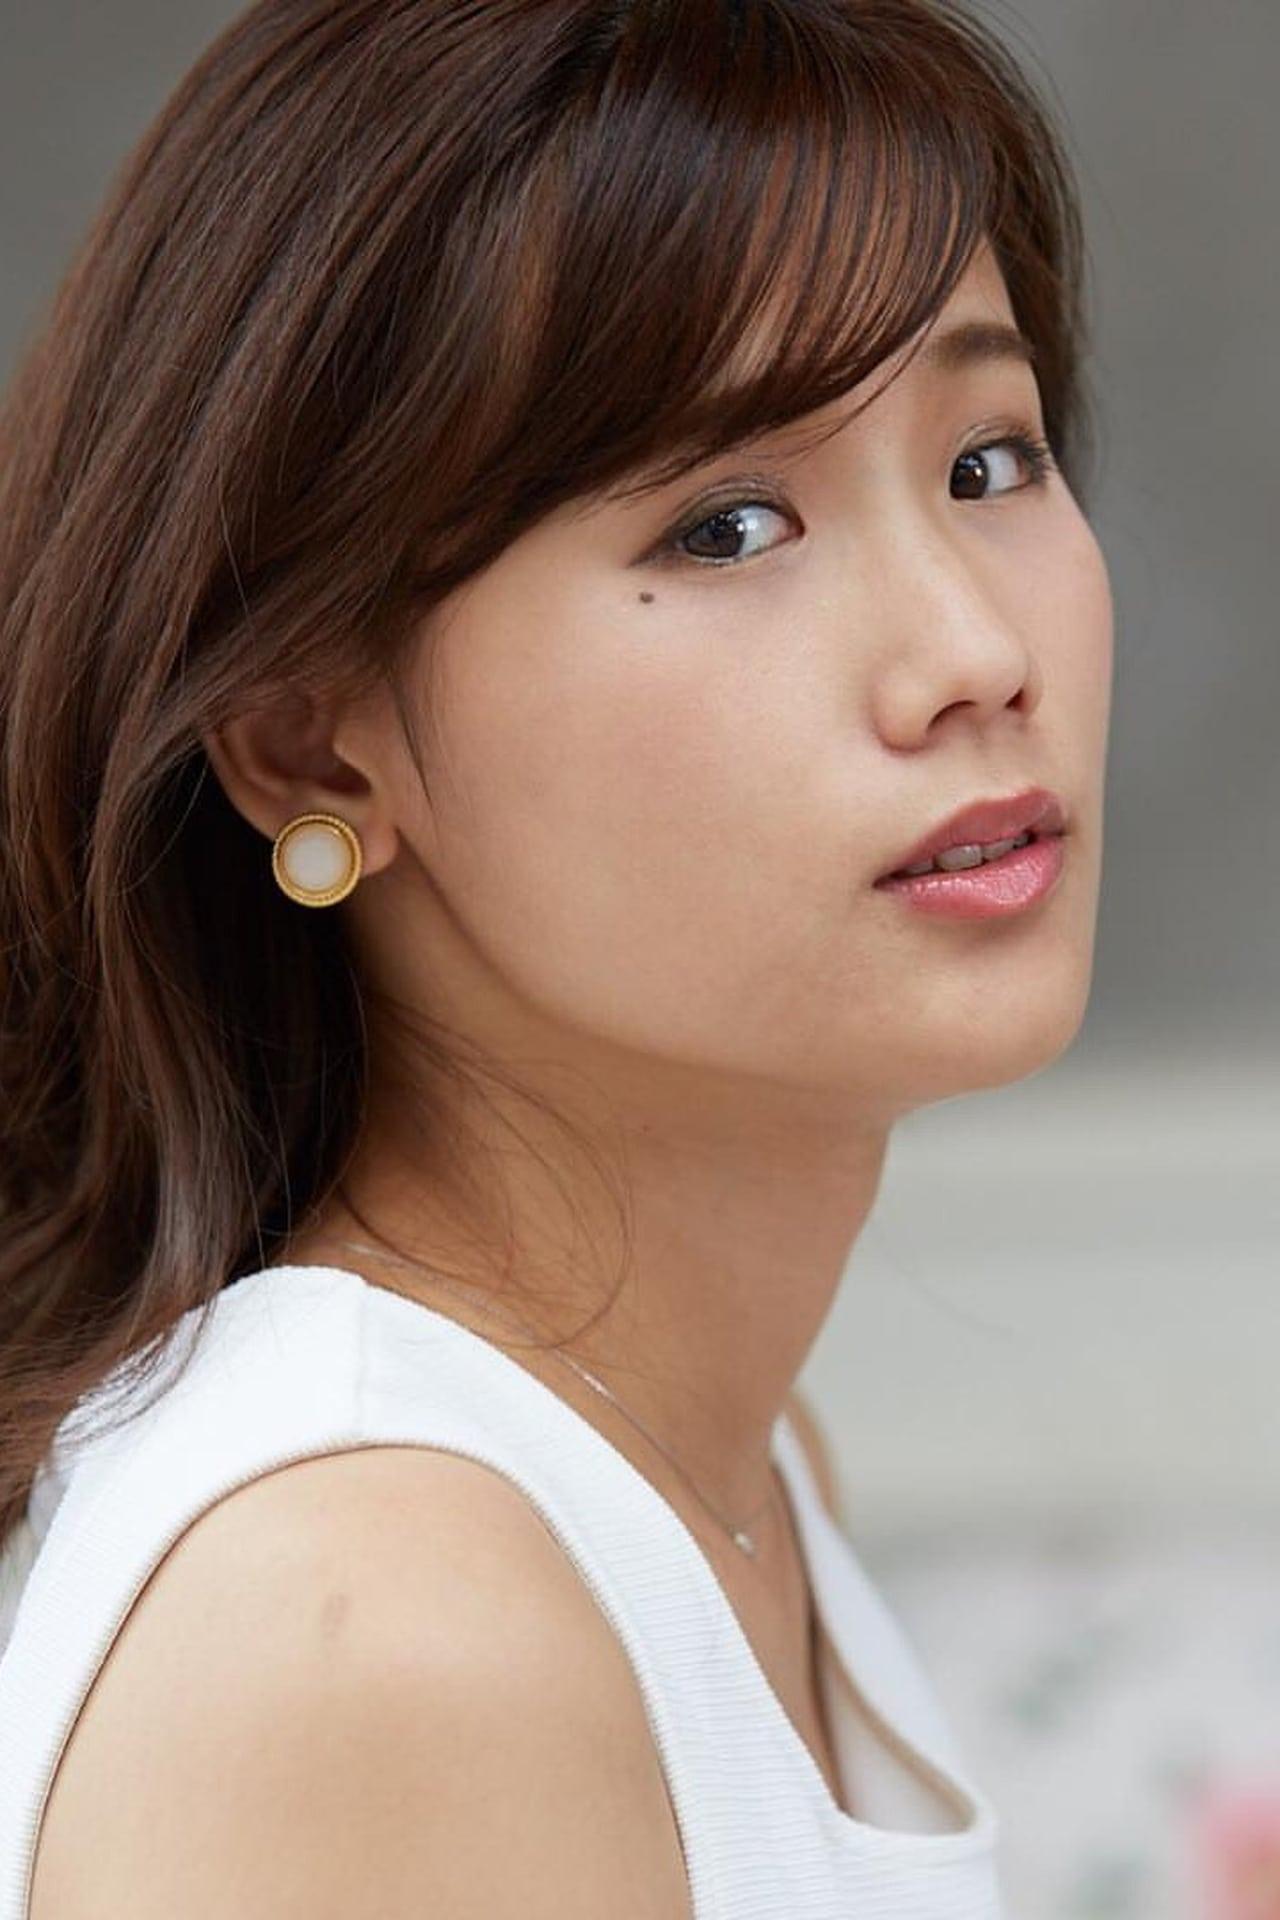 Yuzuki Akiyama is